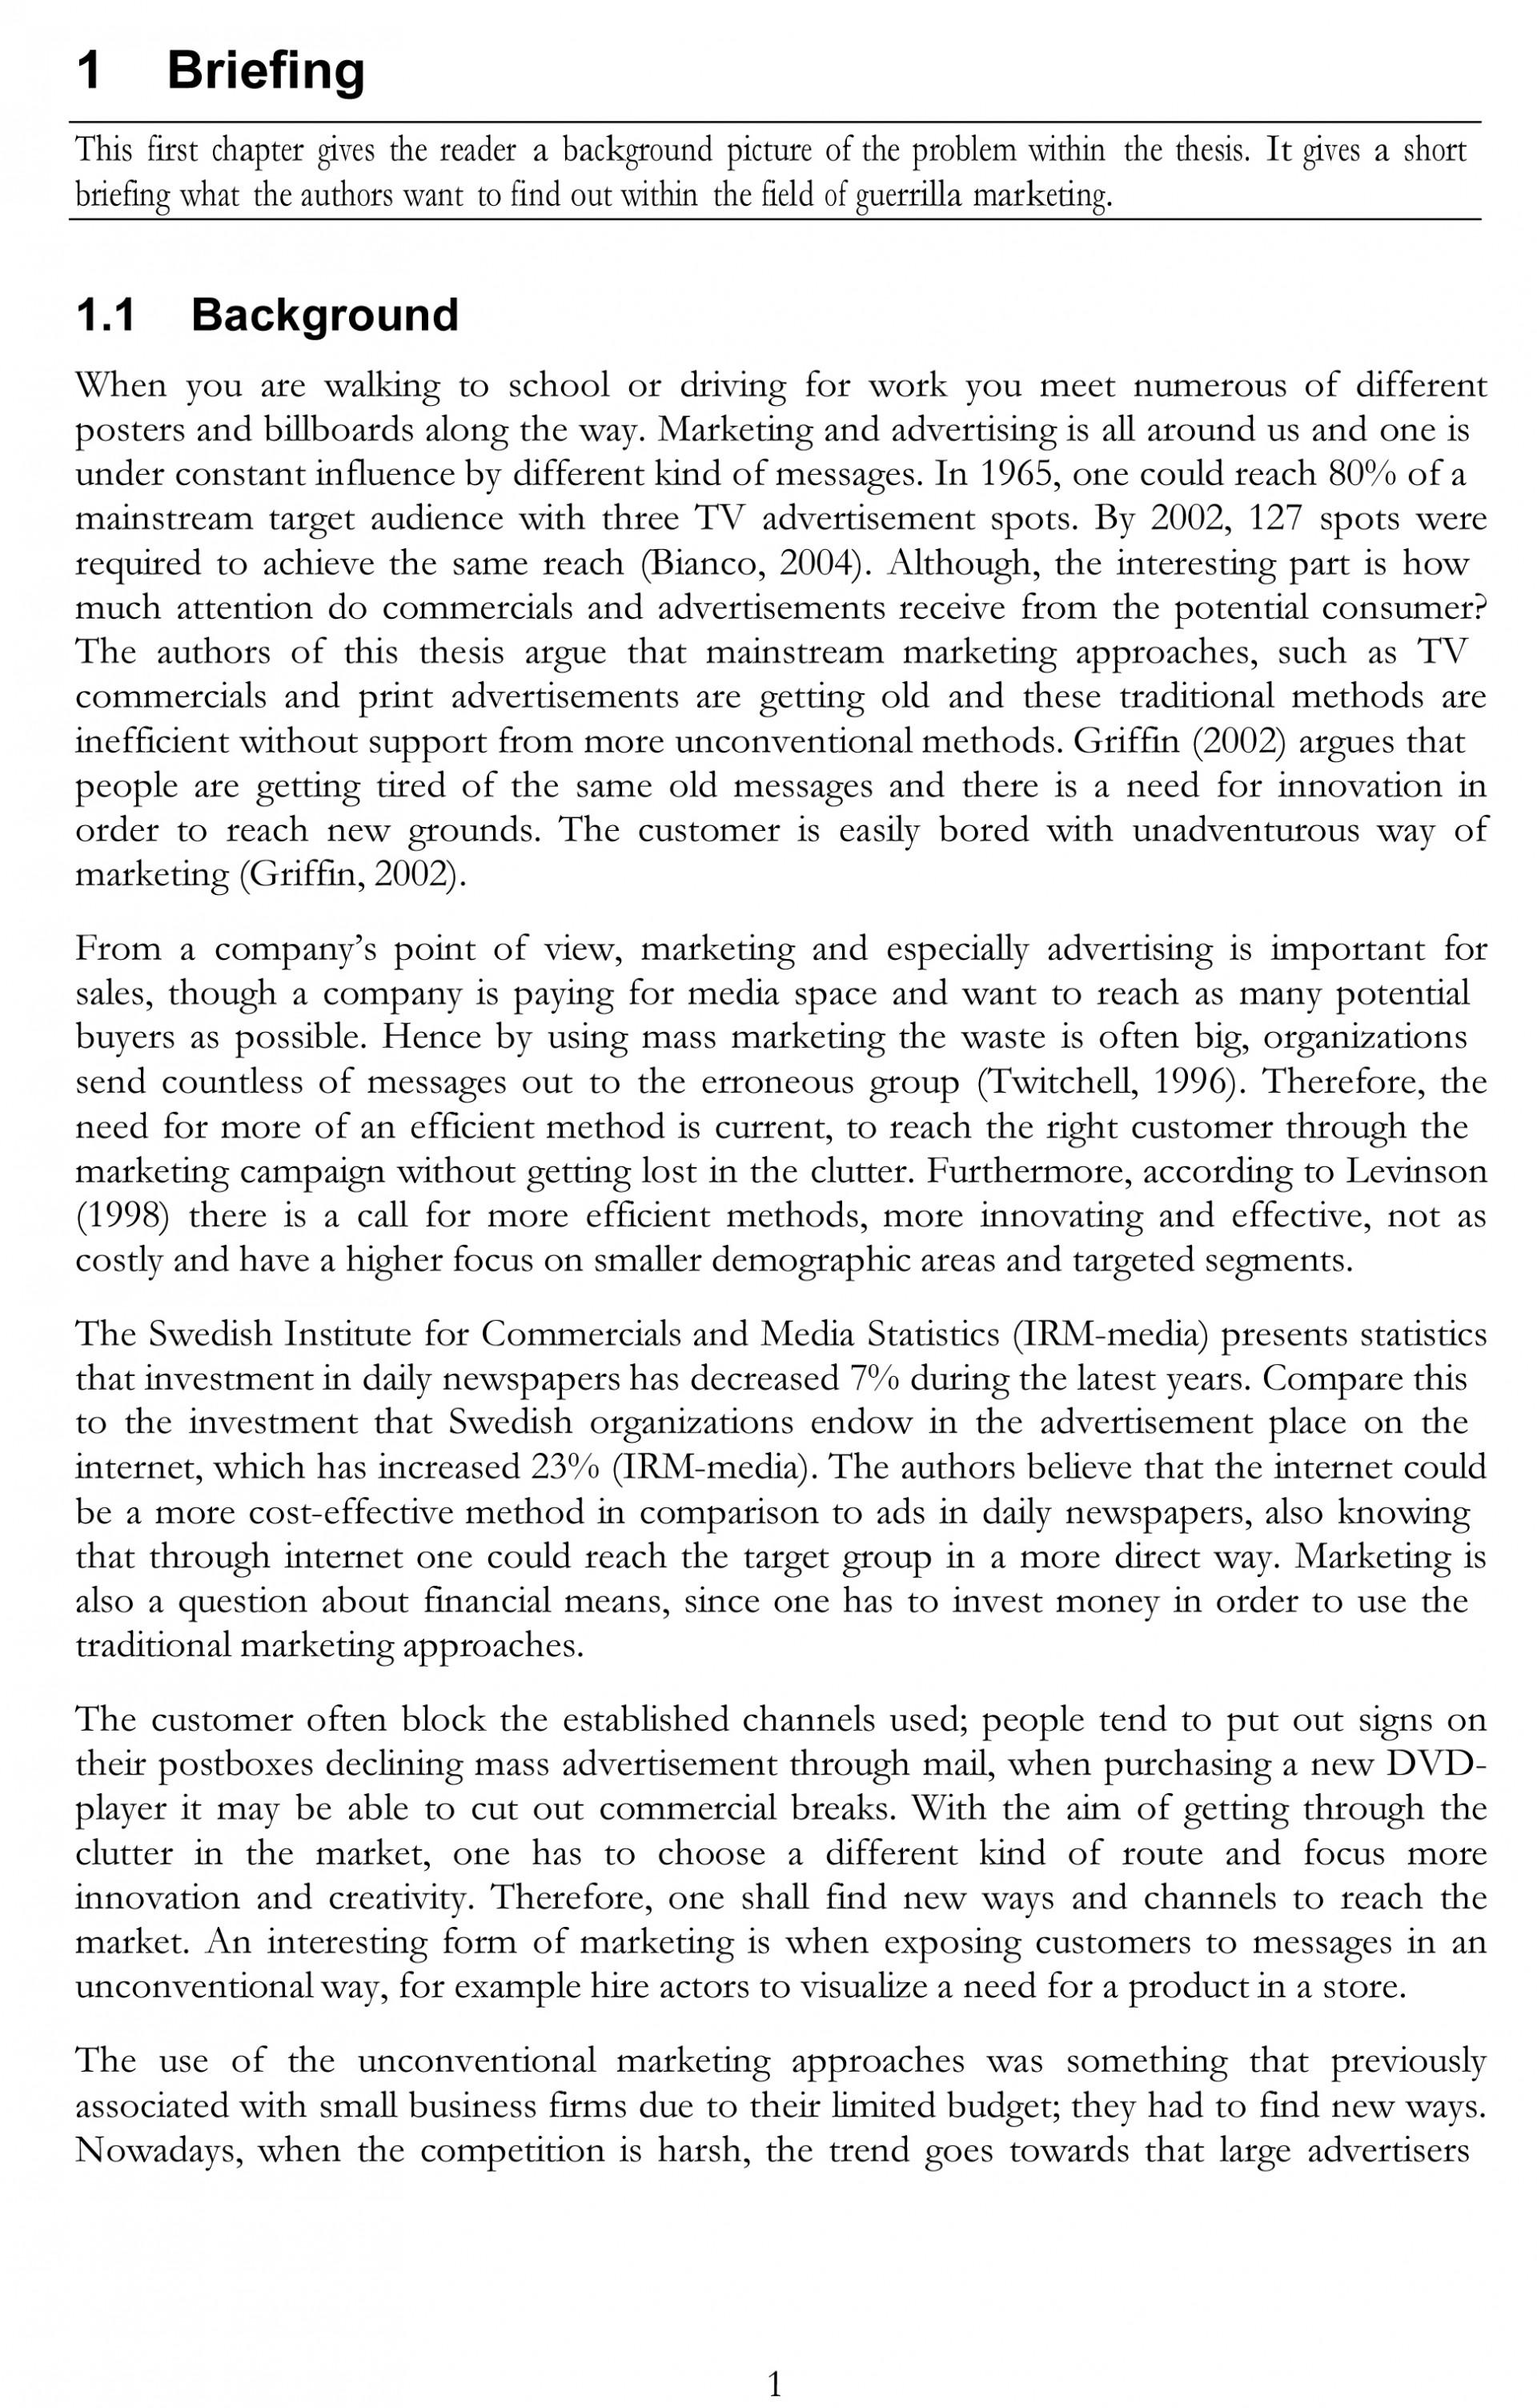 004 Essay Example Argumentative Topics Beautiful 2017 The Most Popular Of List Cxc 1920